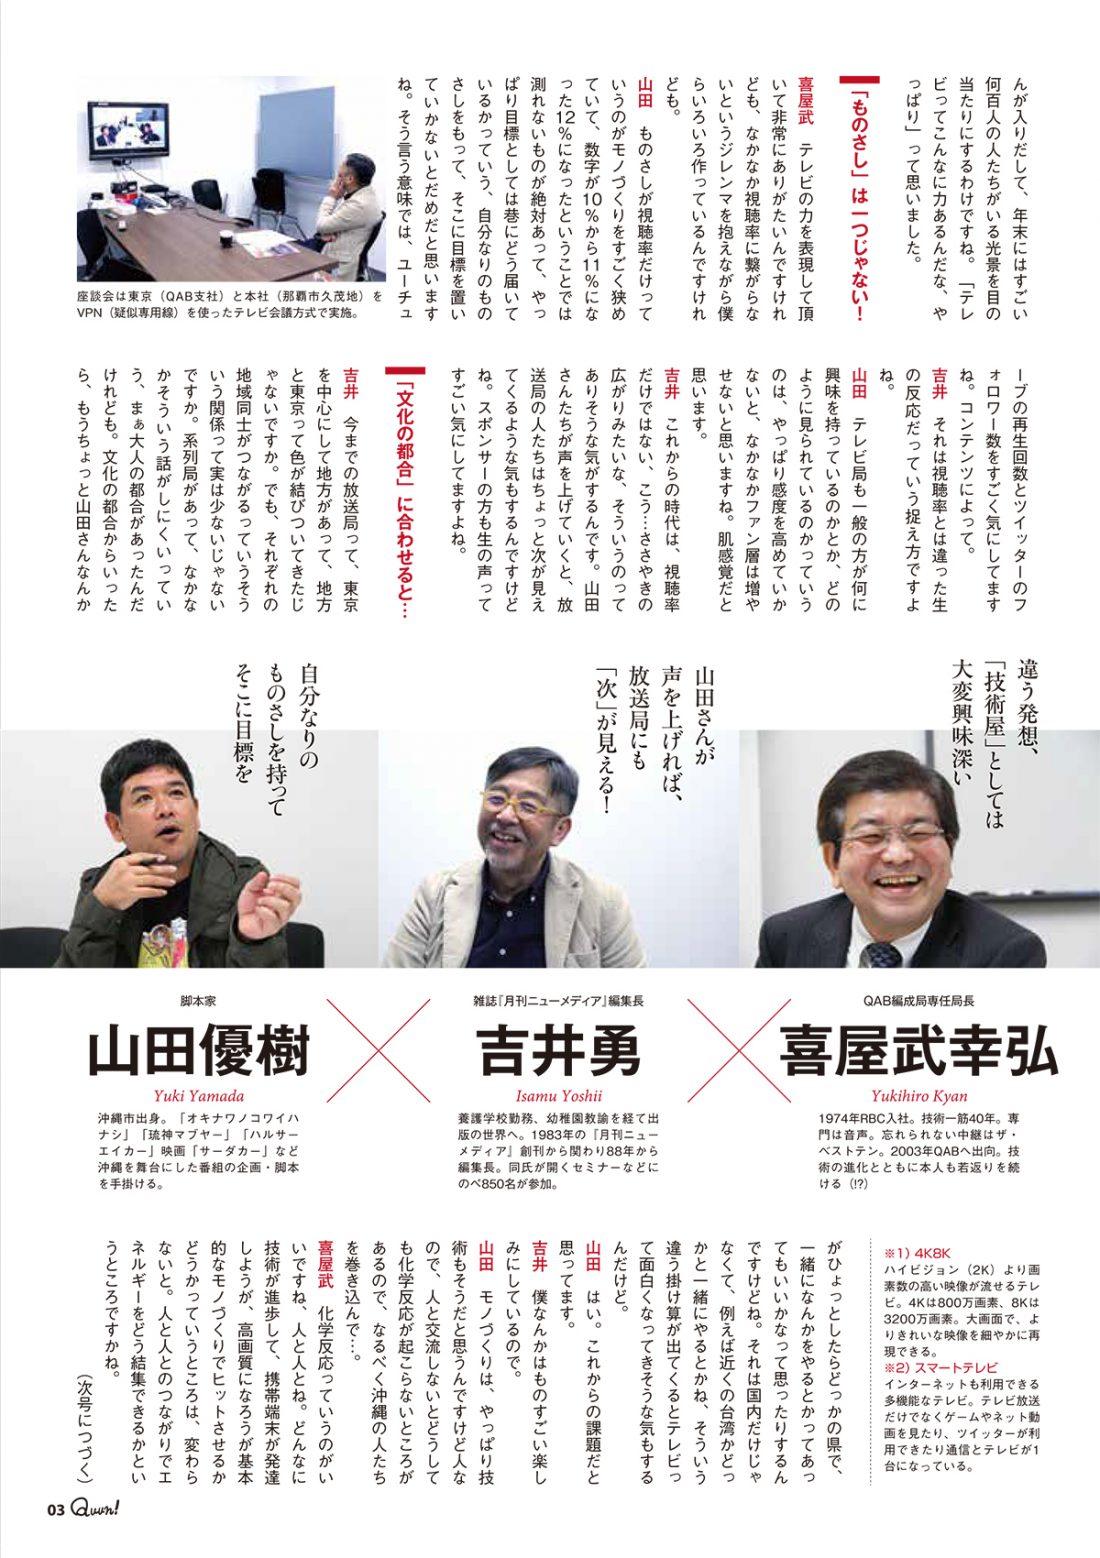 http://www.qab.co.jp/qgoro/wp-content/uploads/quun_0105-1100x1558.jpg